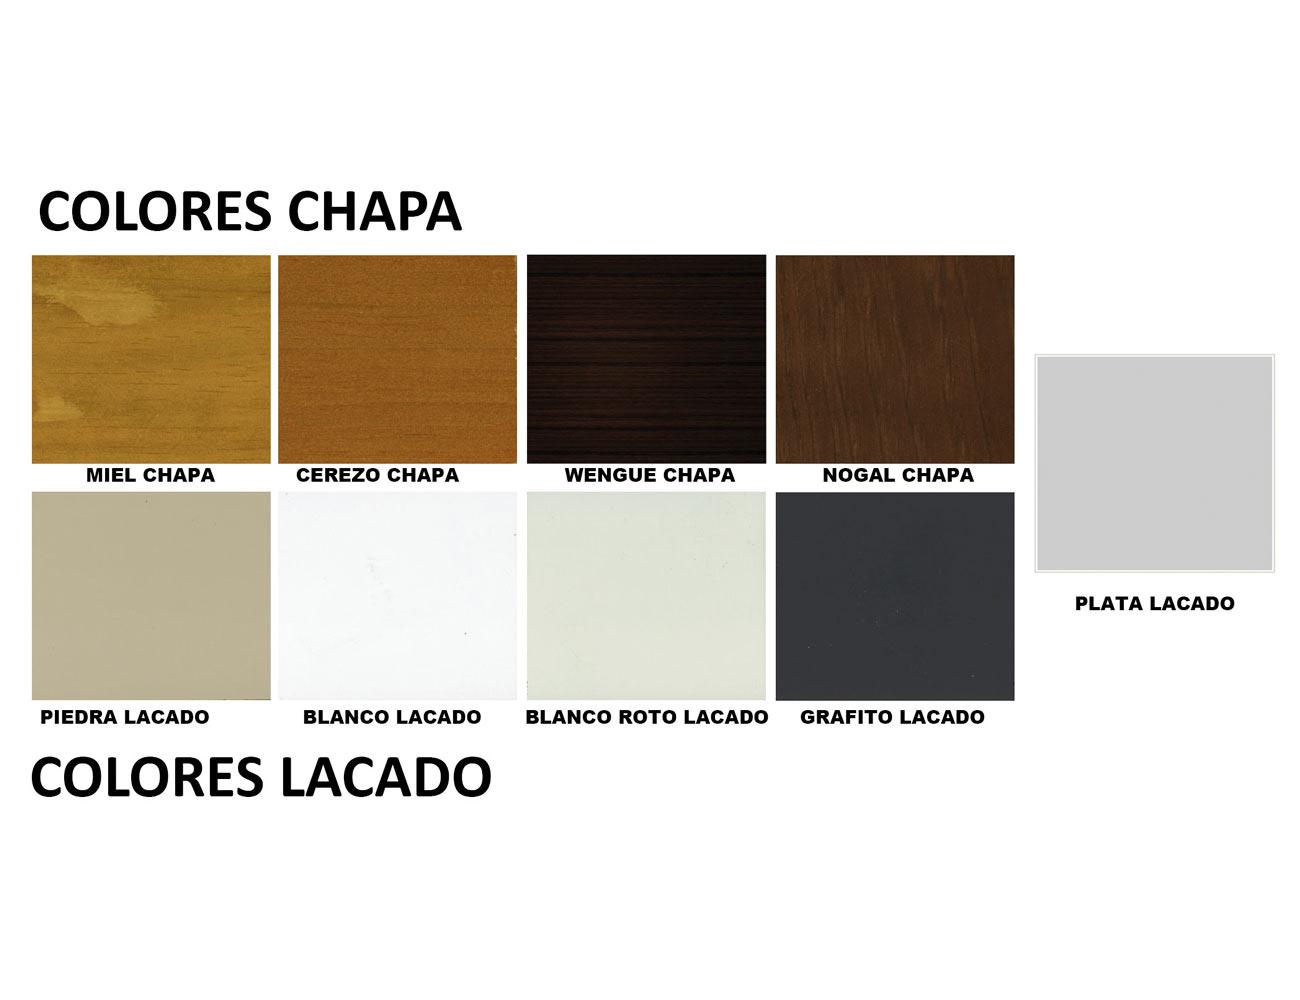 Colores210